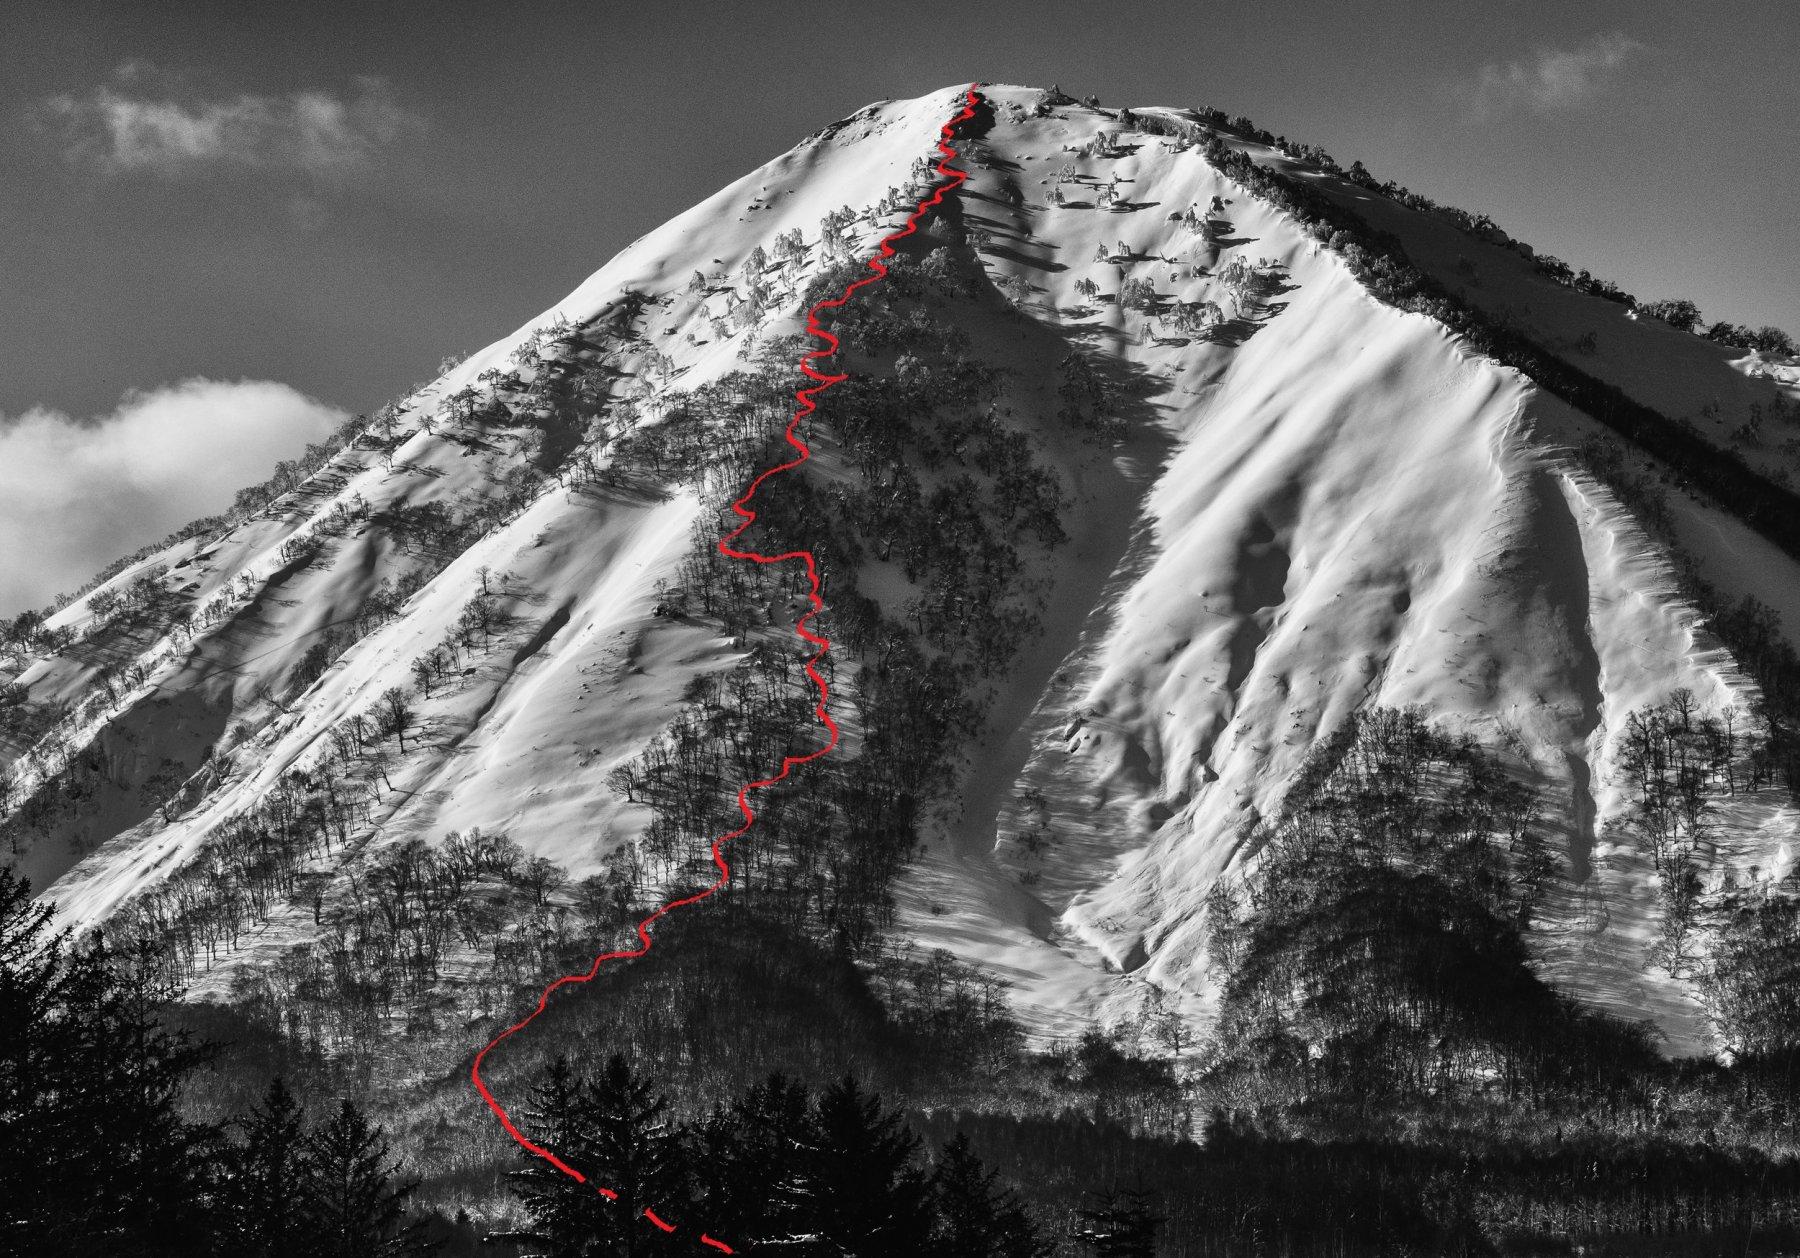 la linea sul versante nord del Shiribetsu